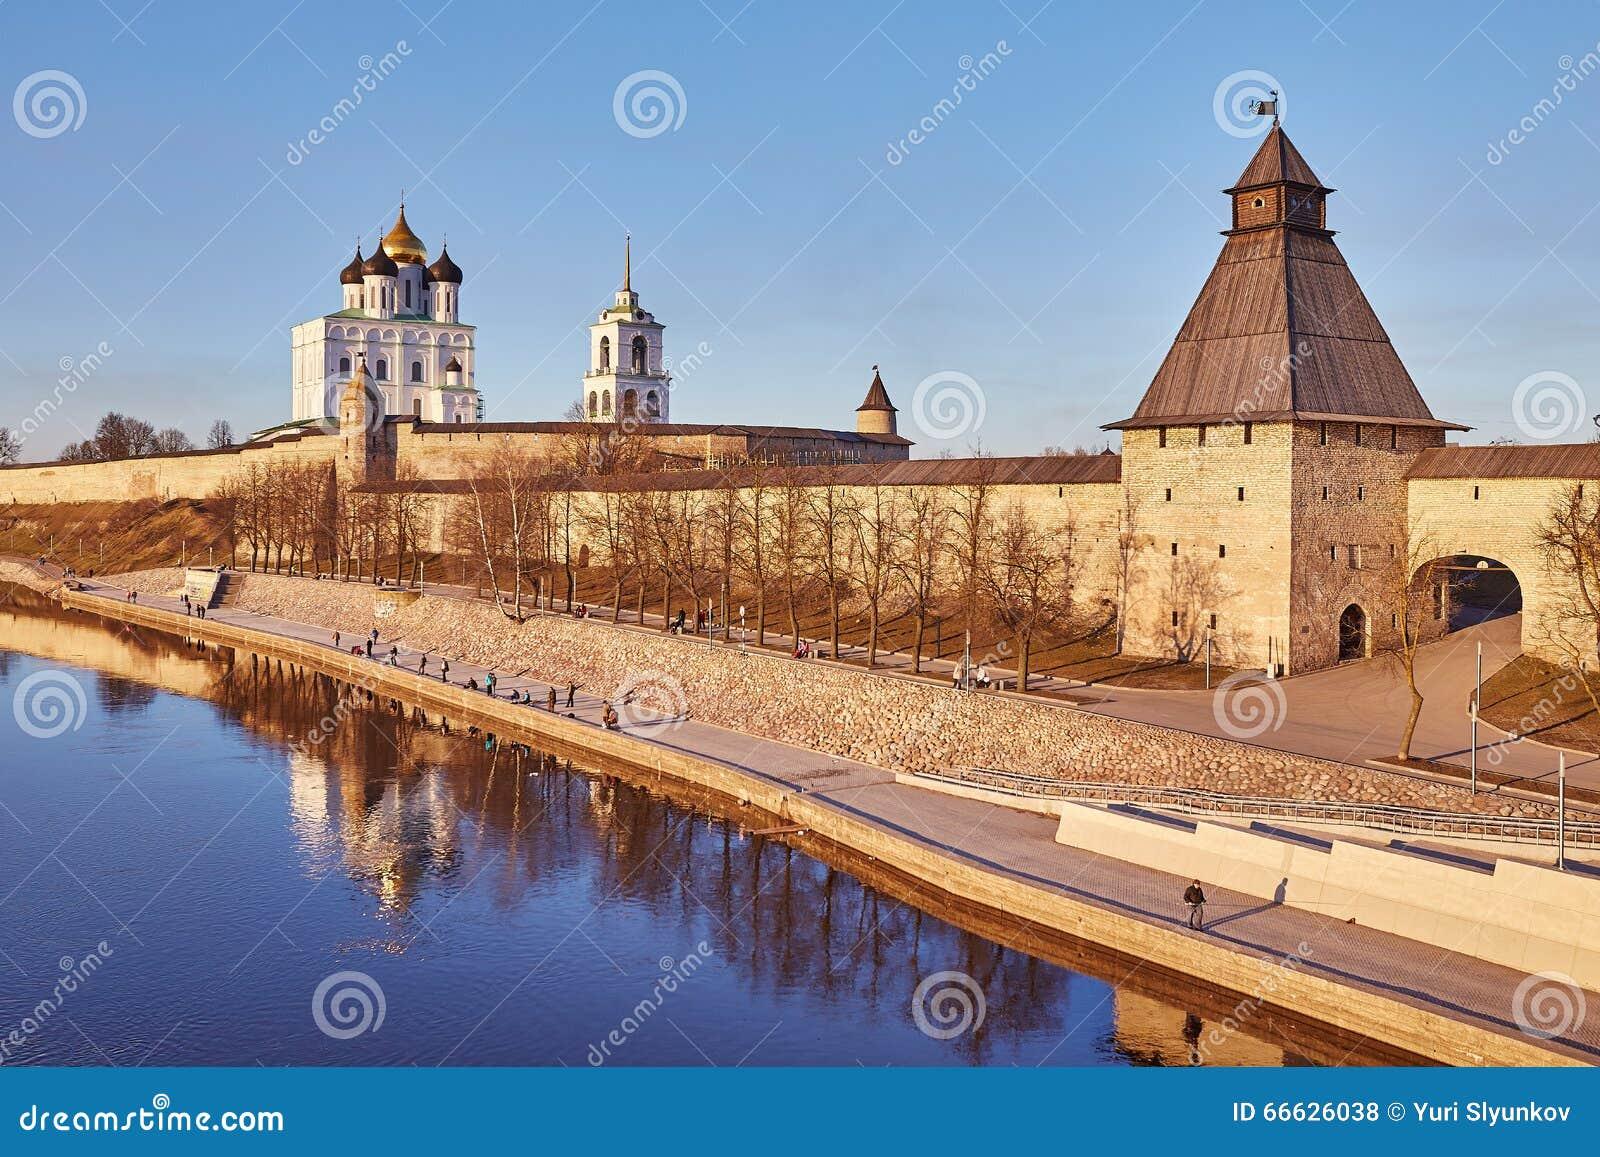 Pskov. Spring. Fishermen on river quay Great. Fortification